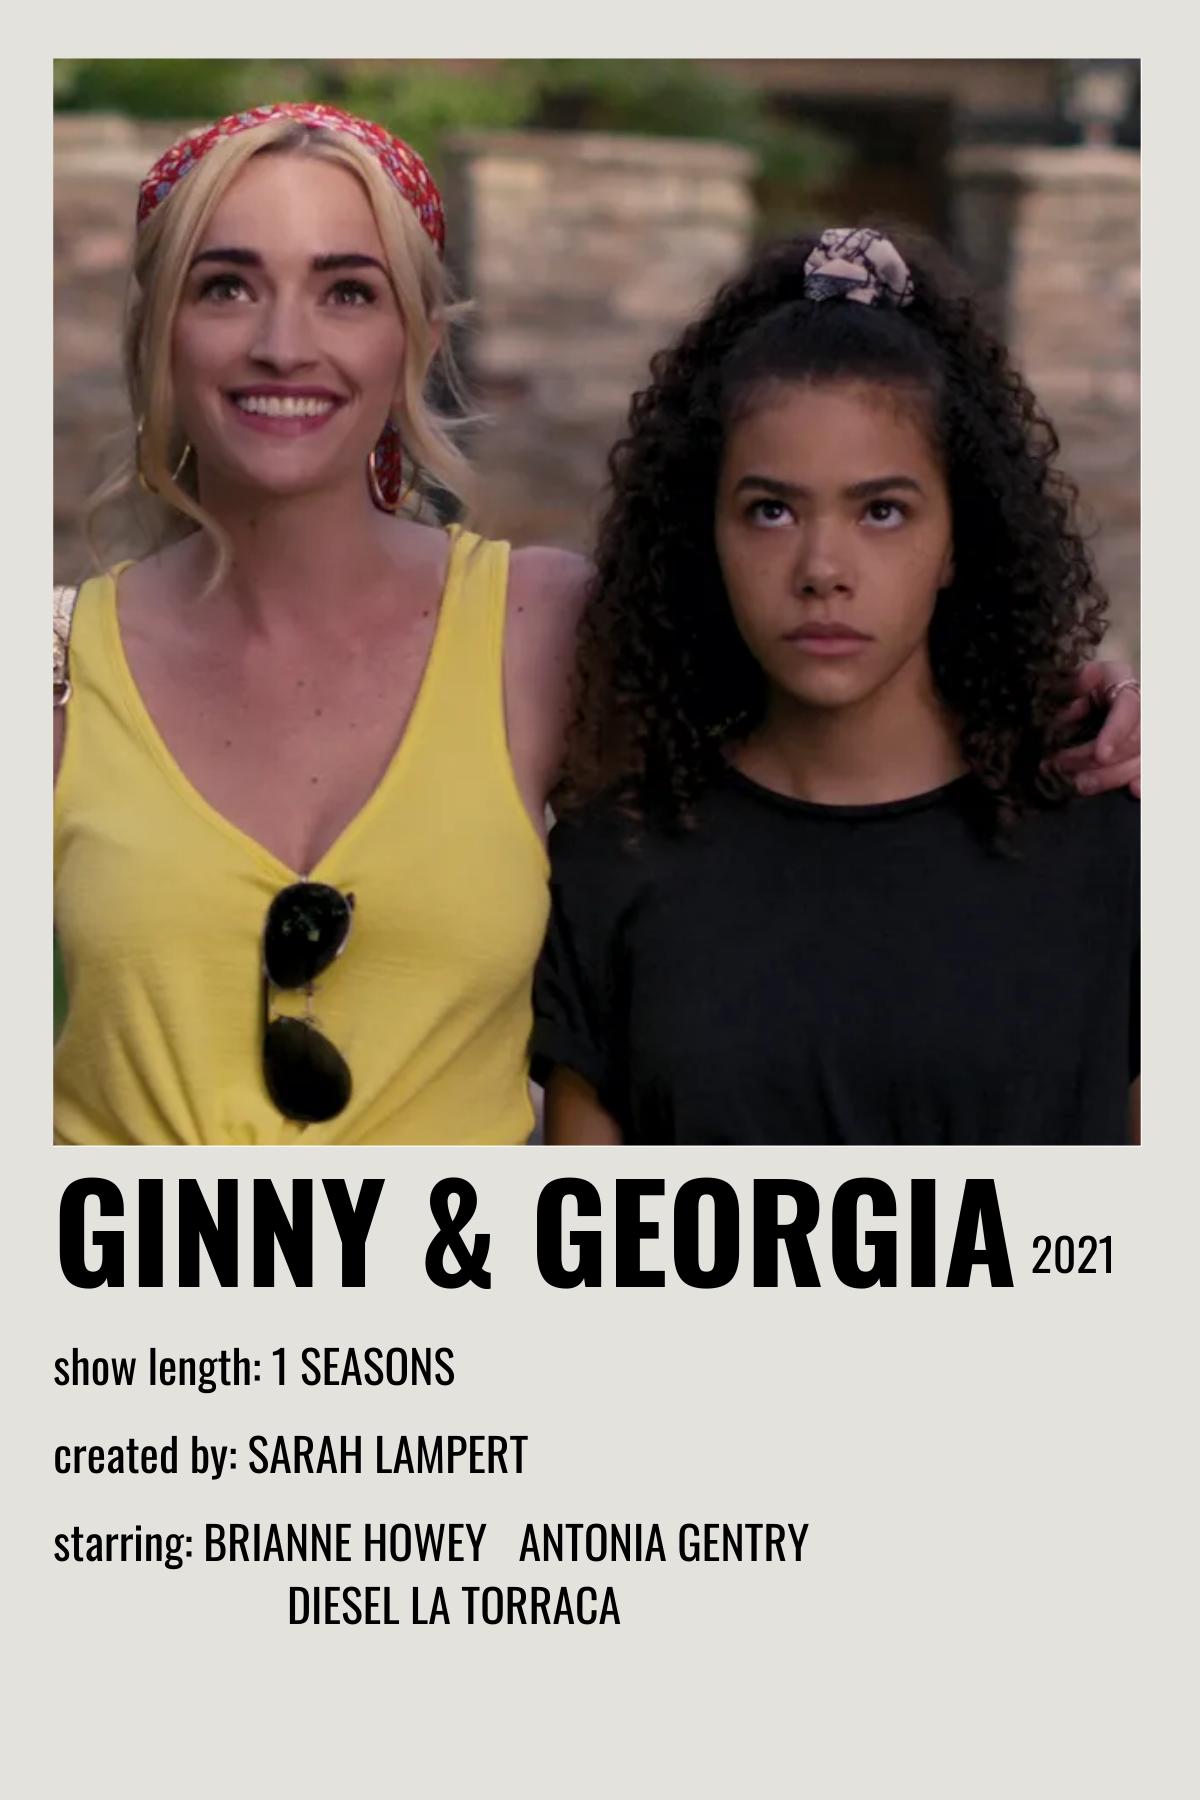 ginny and georgia movie poster